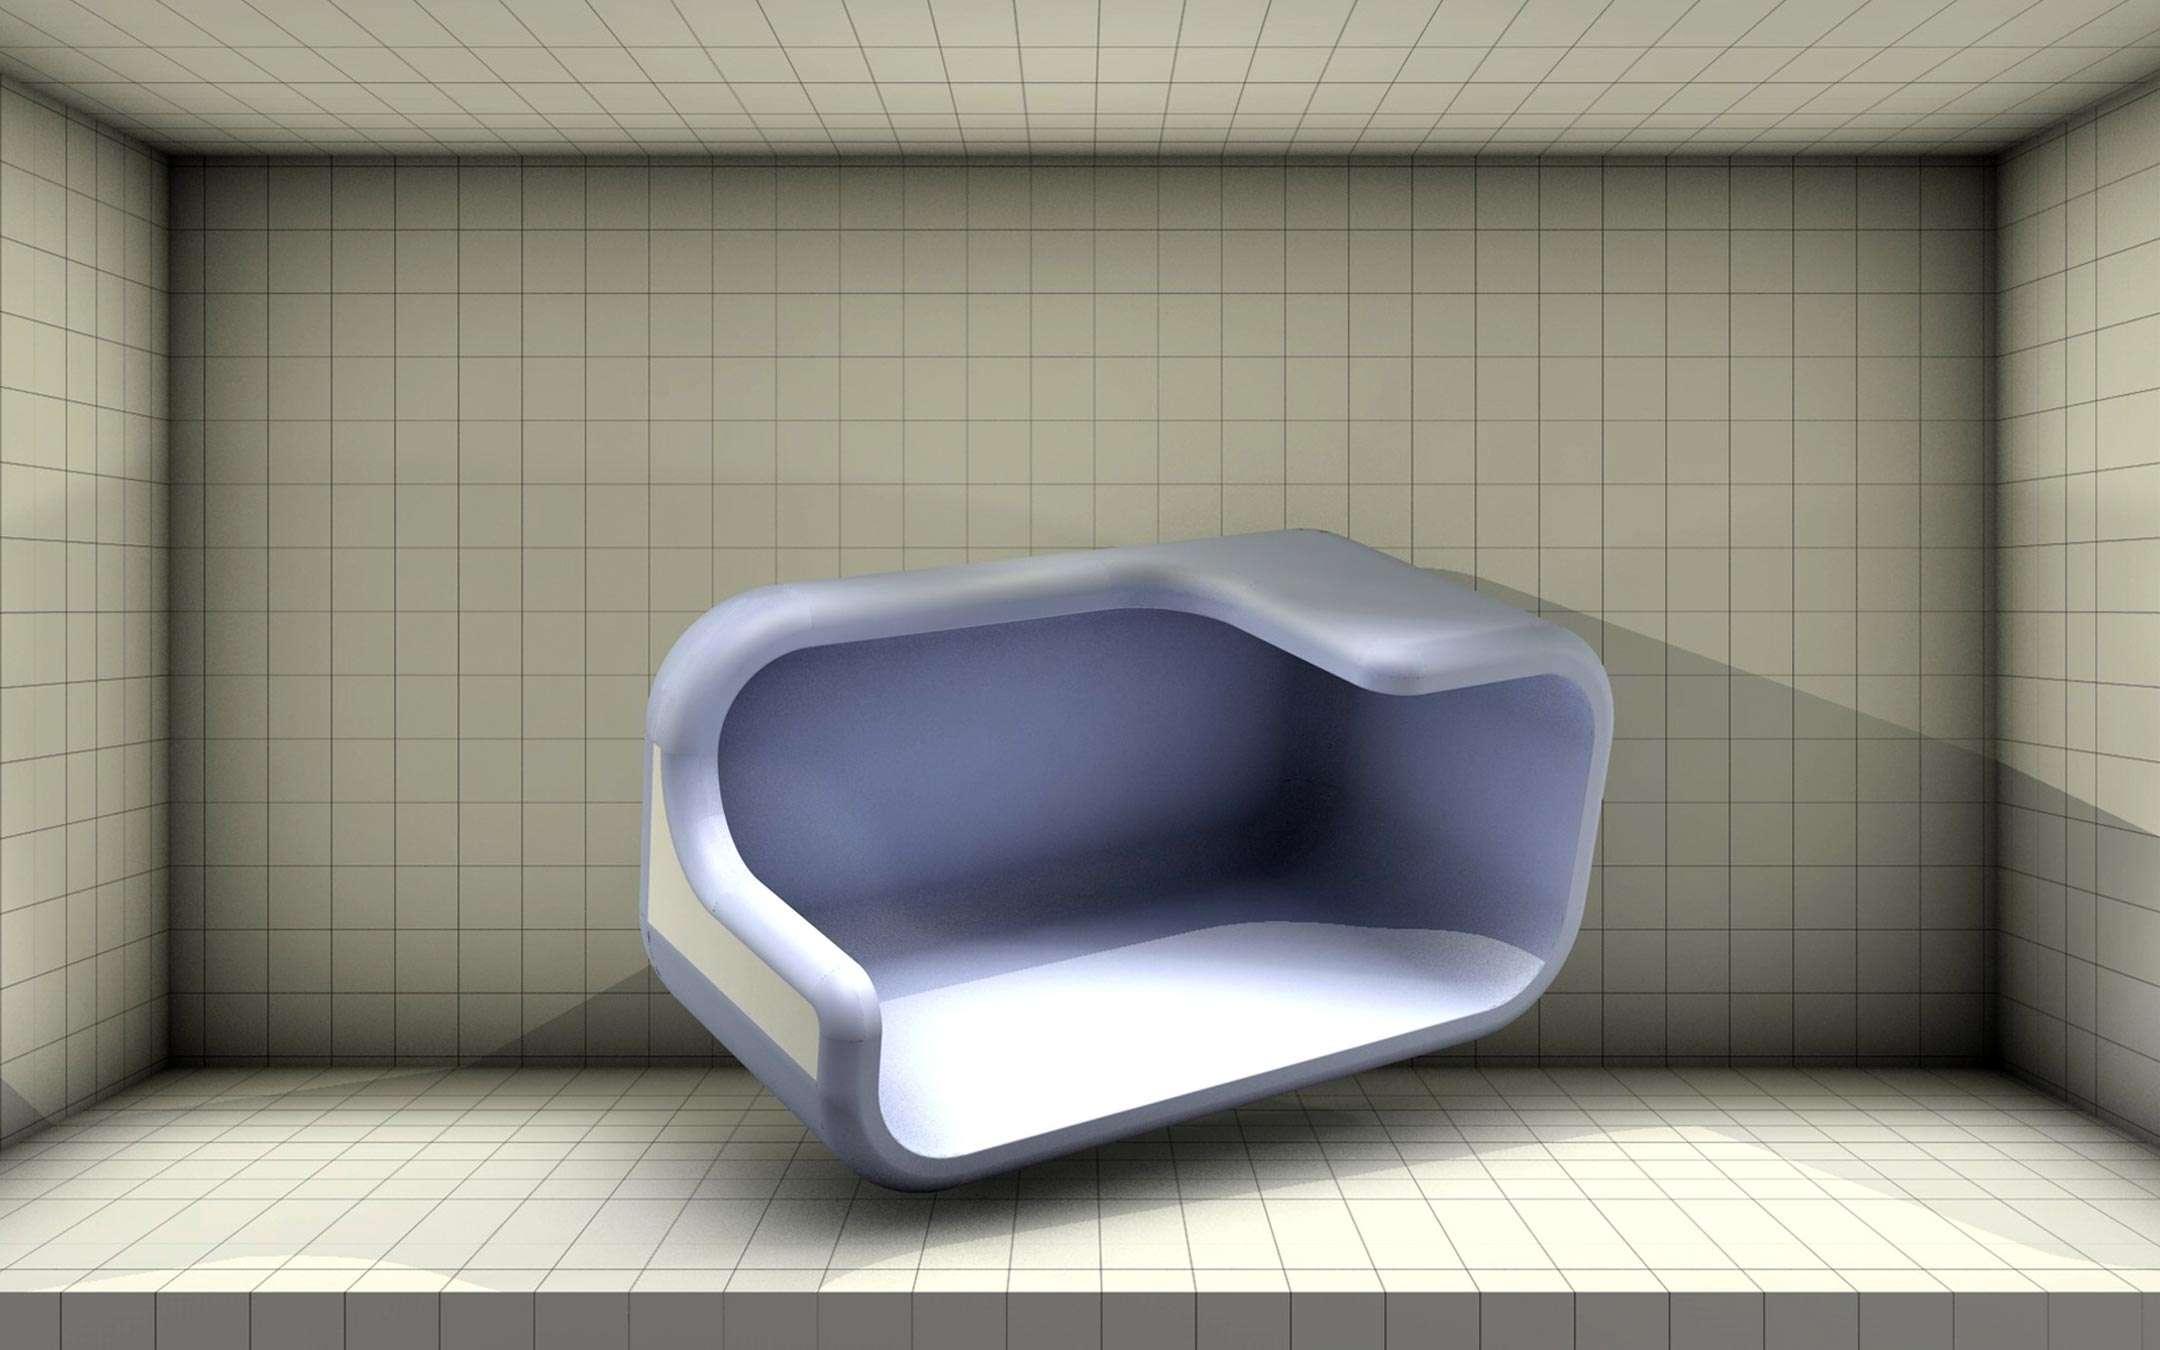 Stampanti 3D: bene nell'industria, male in casa